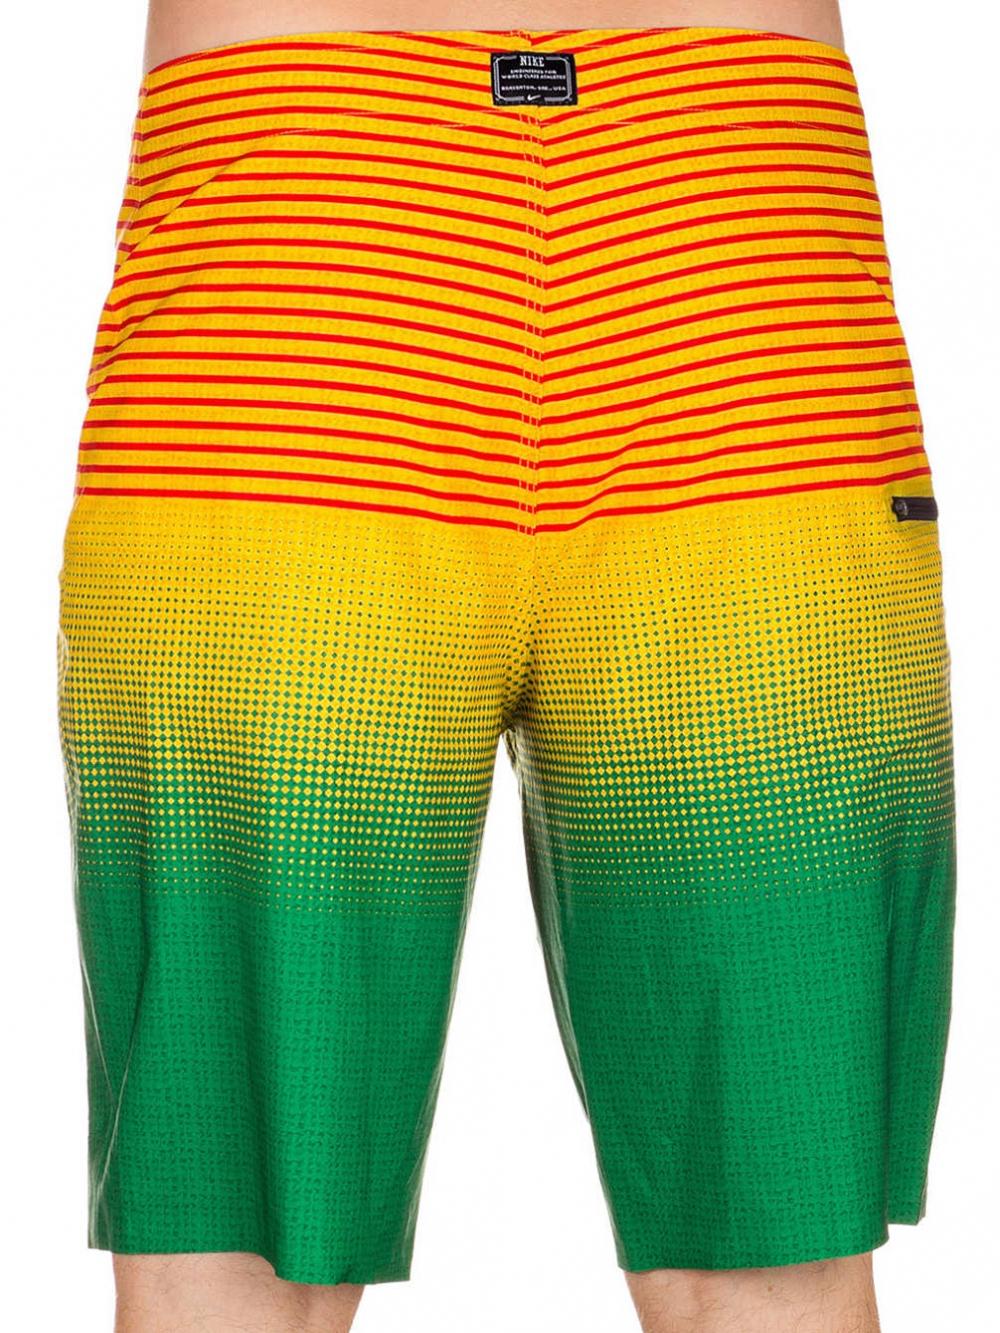 NIKE Legacy Lowers Boardshorts (размер 36/XL) - 2